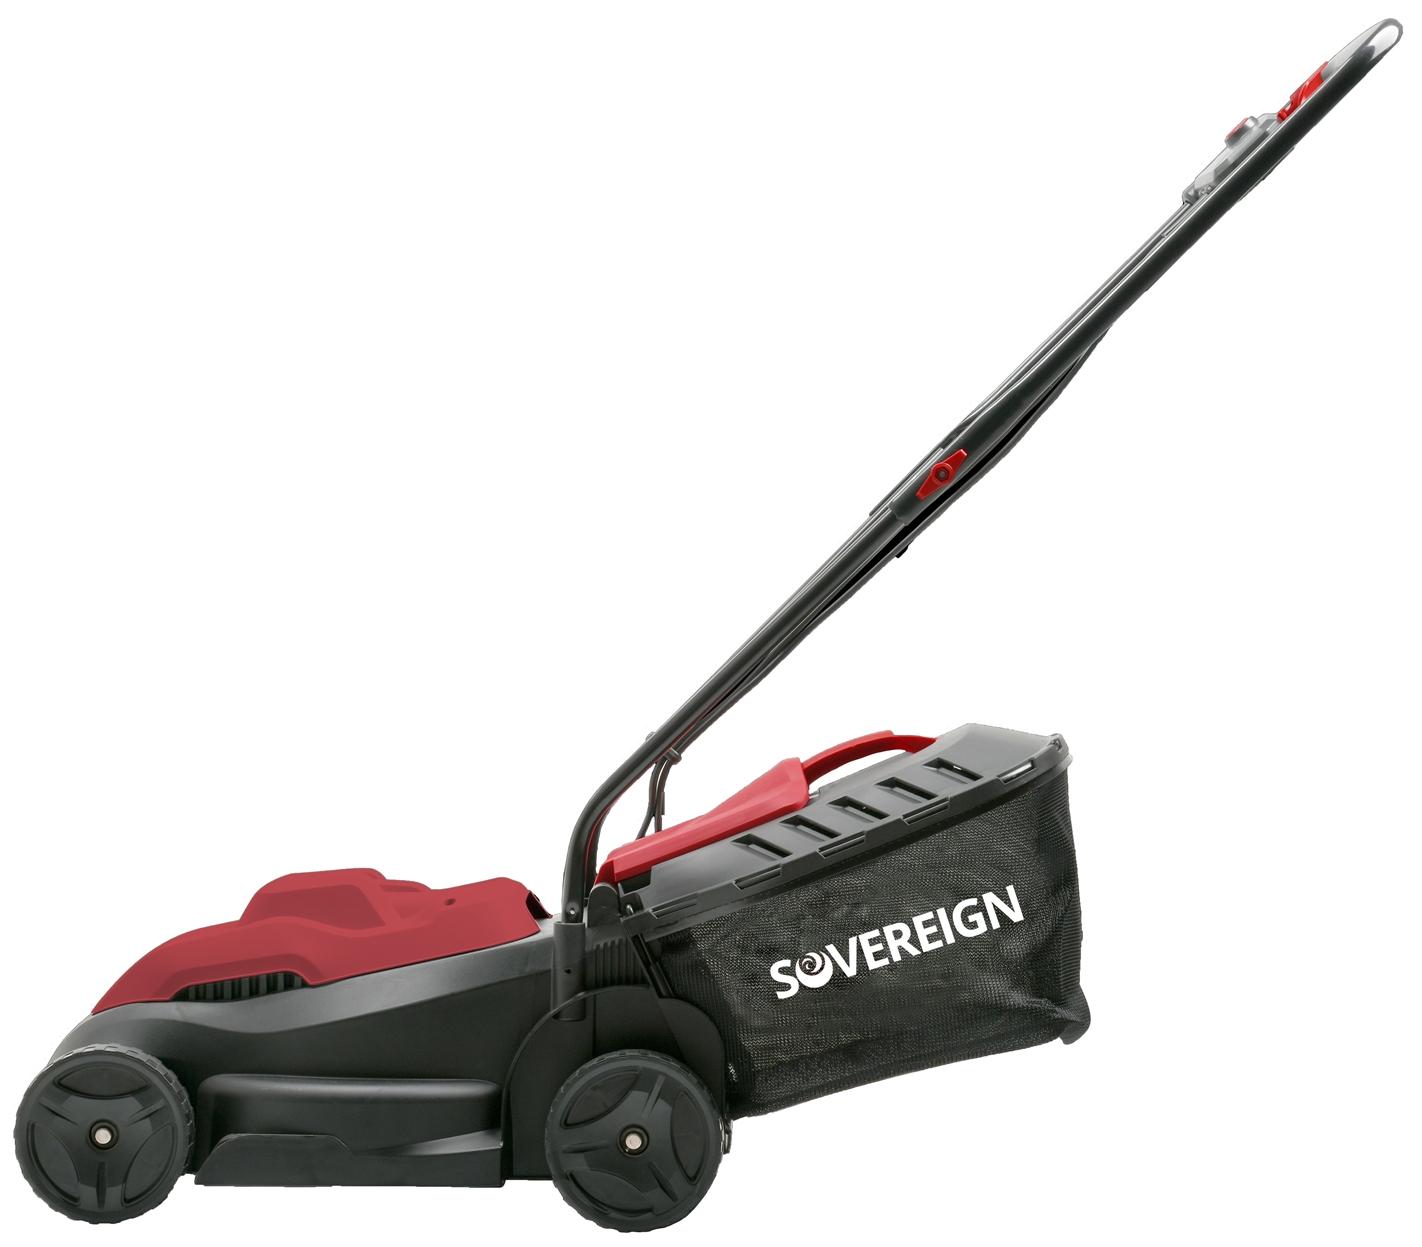 Sovereign Lawn Mower 32cm 1000W - £39 @ Homebase (+P&P £6)